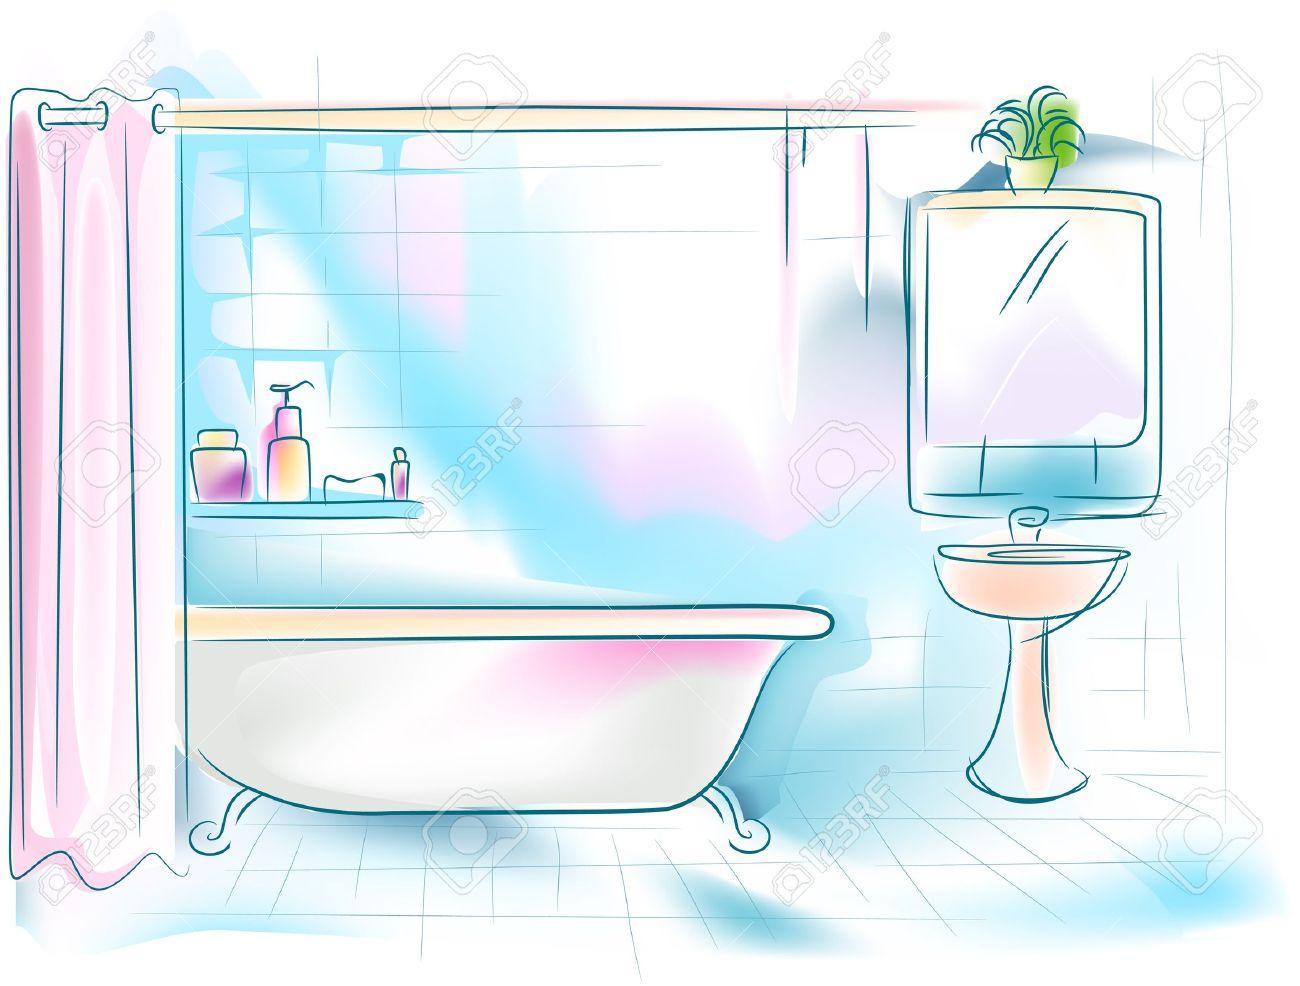 Bath clipart animated. Bathroom free panda images